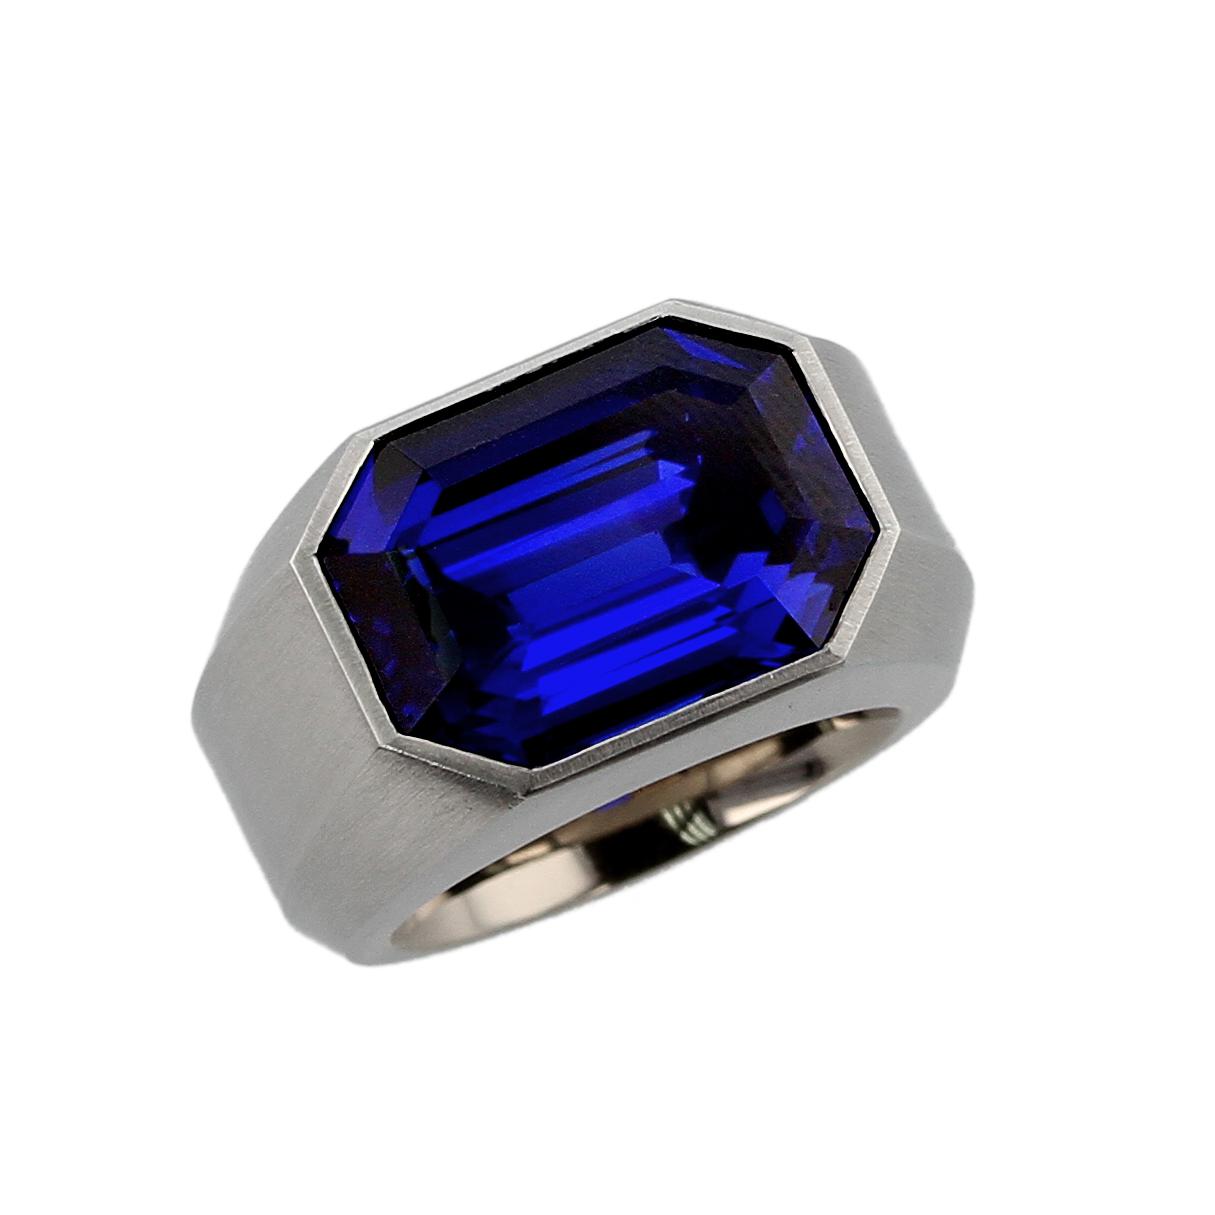 12+ CT. ROYAL BLUE BURMA SAPPHIRE & STEEL RING BY HEMMERLE